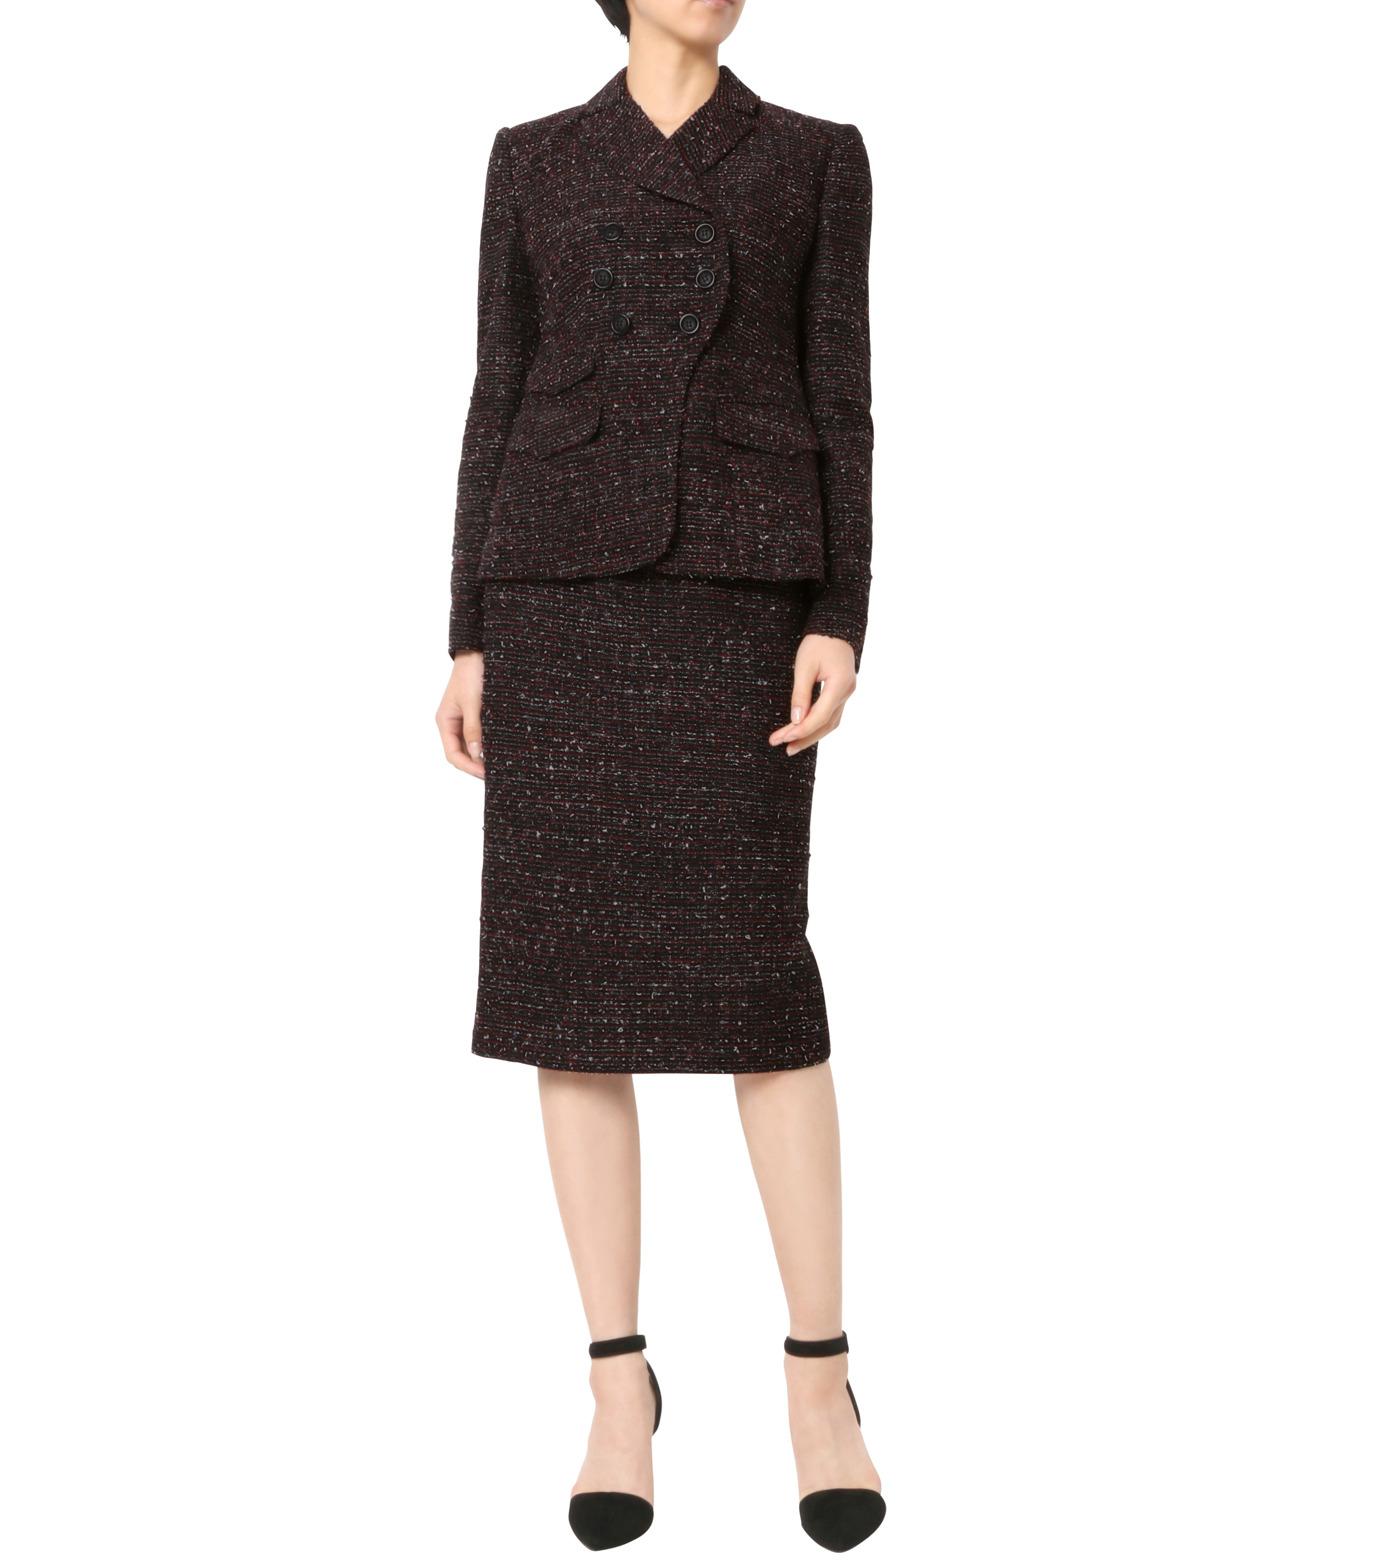 Altuzarra(アルトゥザラ)のTweed Pencil Skirt-BLACK(スカート/skirt)-316-501-465-13 拡大詳細画像3